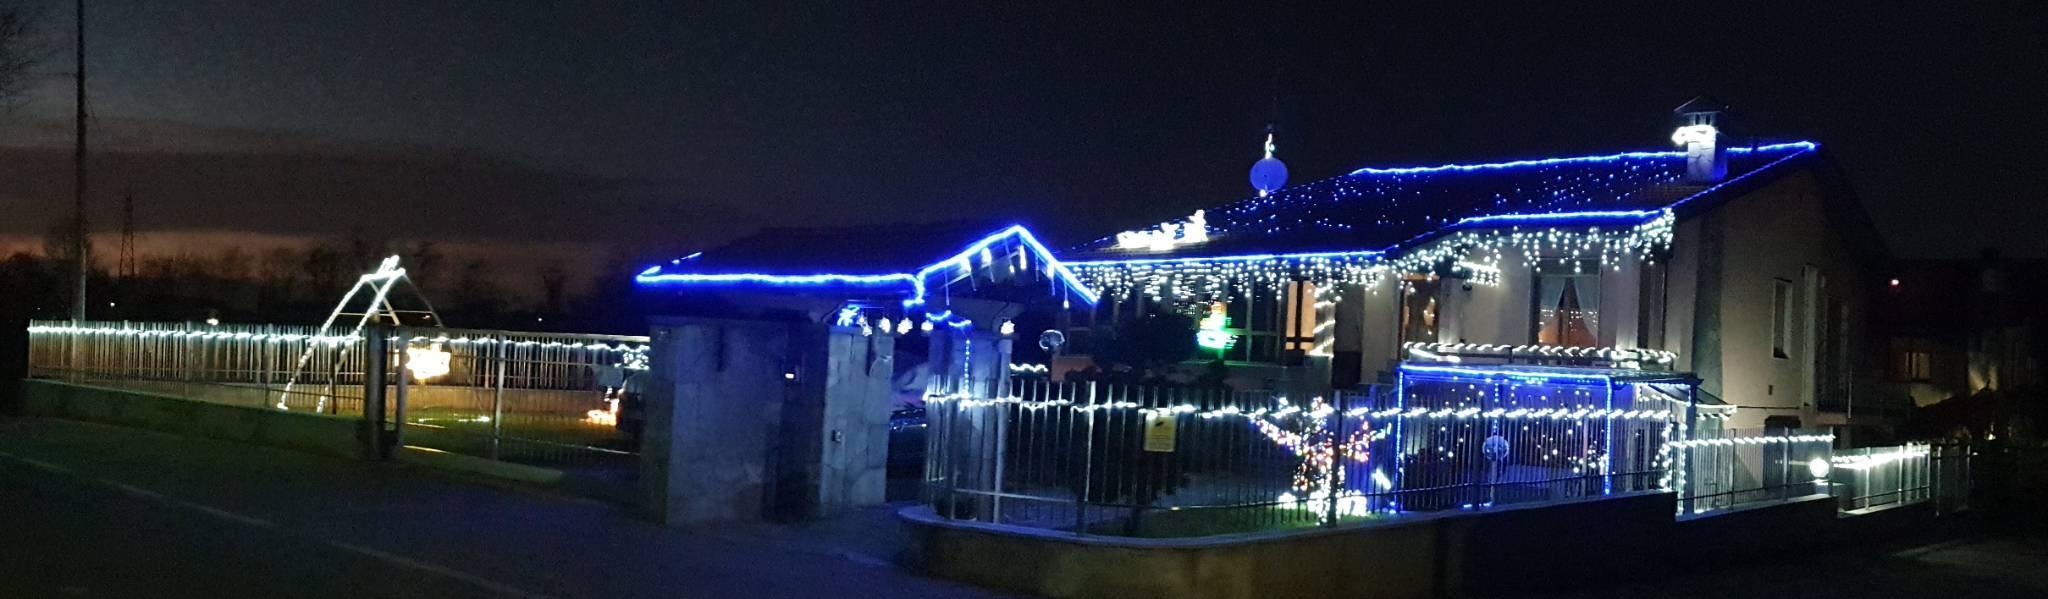 La casa illuminata